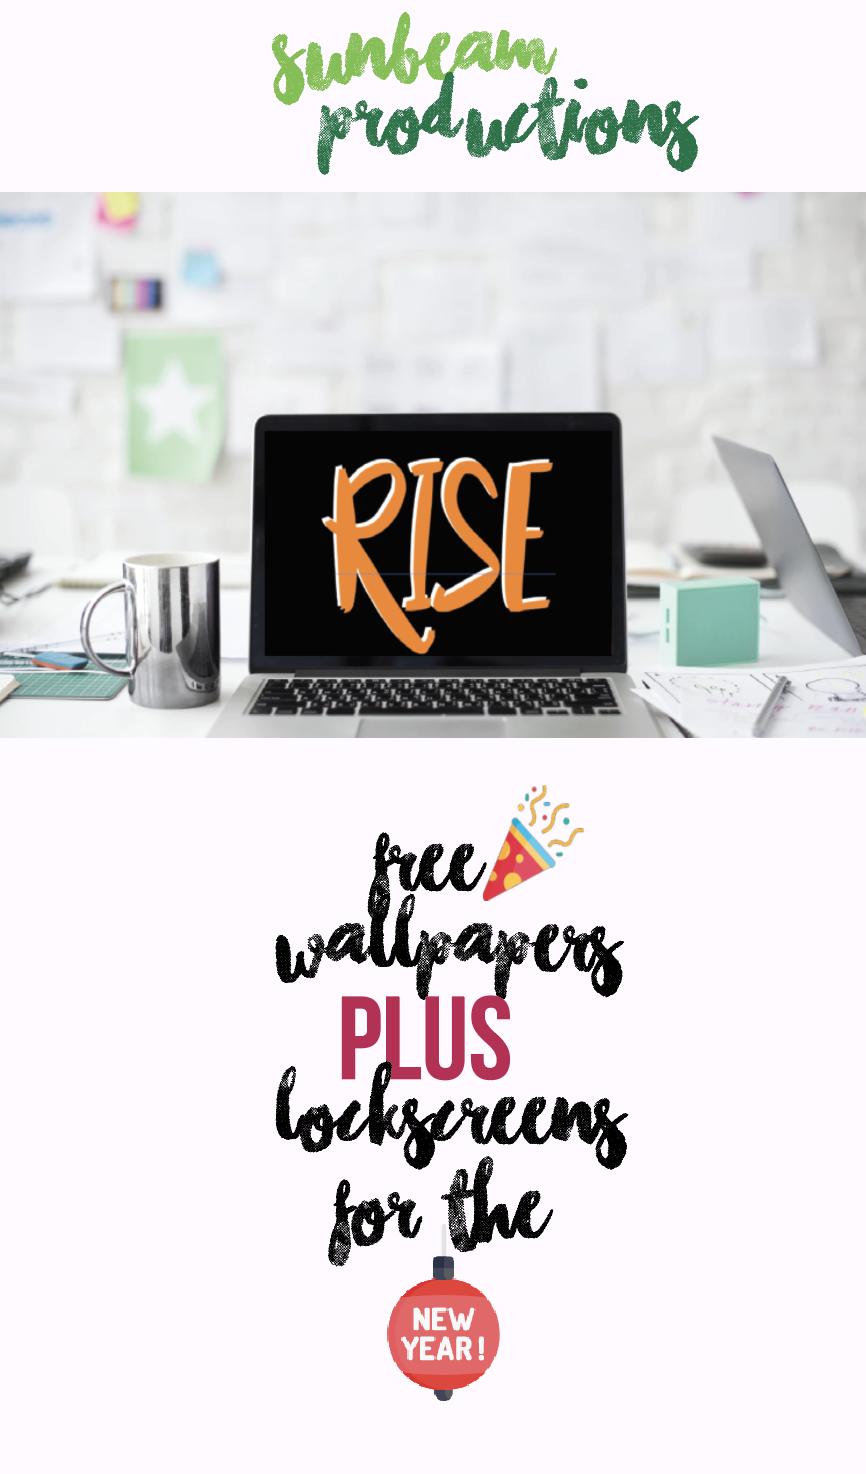 Free New Year 2018 Wallpaper Lockscreen Wallpapers Lockscreens Aesthetic Tumblr Motivational Quotes Quote Rise Selena Gomez